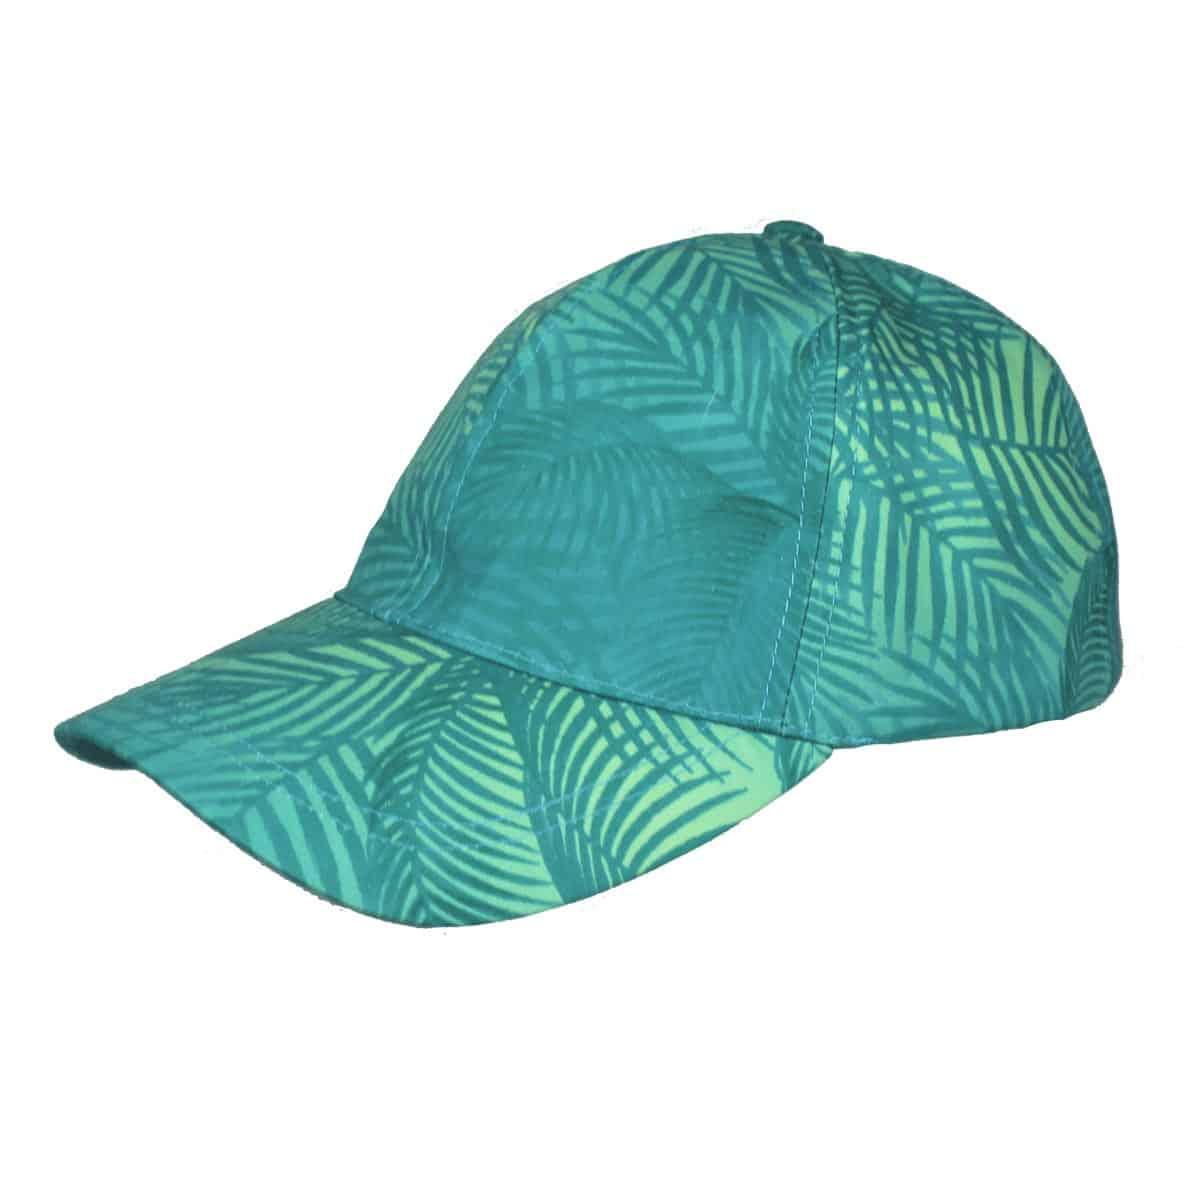 palmasverdescap pgc1260 grn 3